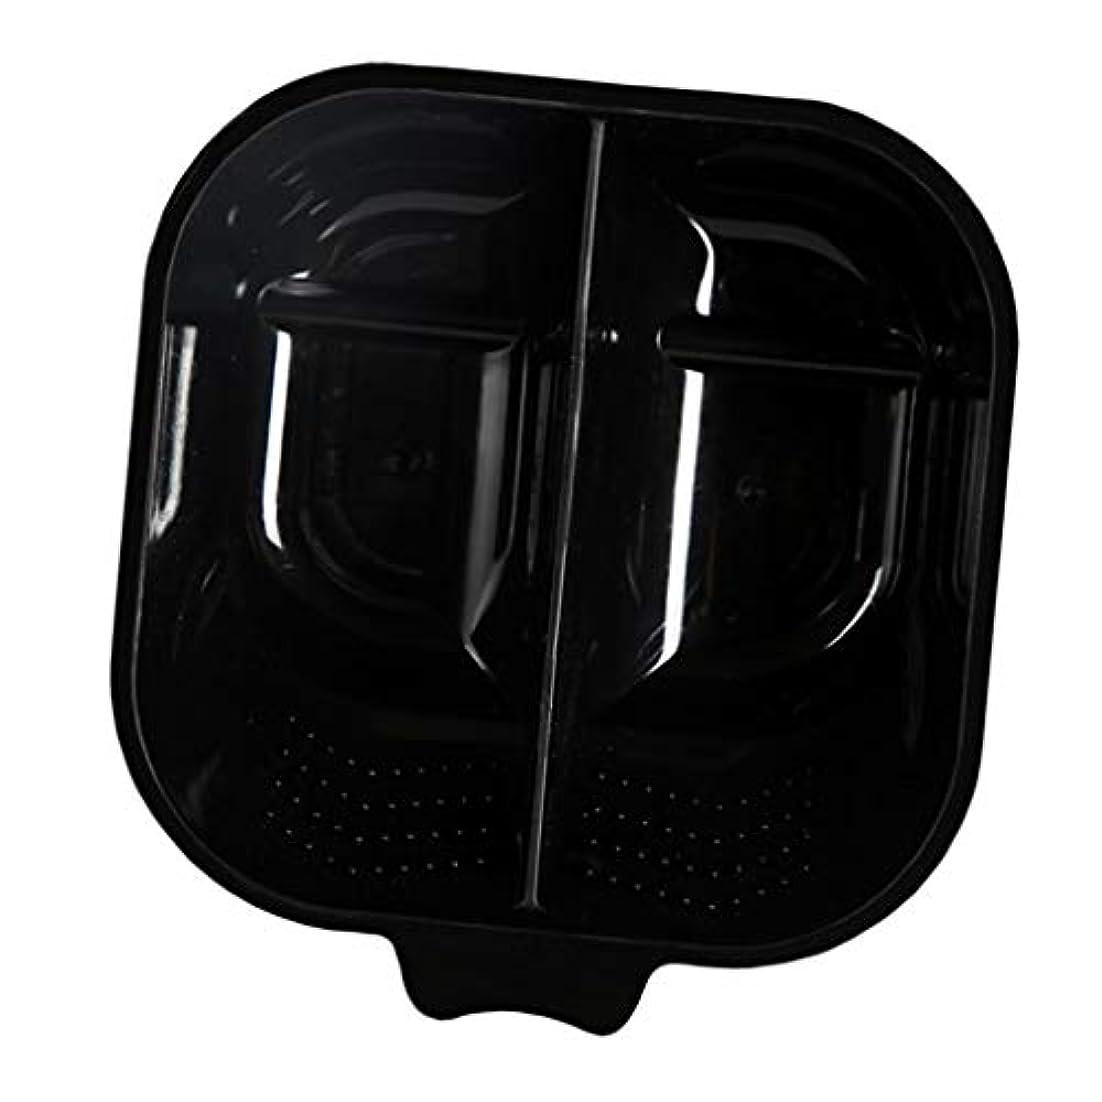 Toygogo ヘアカラーボウル ヘアカラーリング用品 ヘアカラープレート 毛染め 染料 混ぜる サロン プロ用品